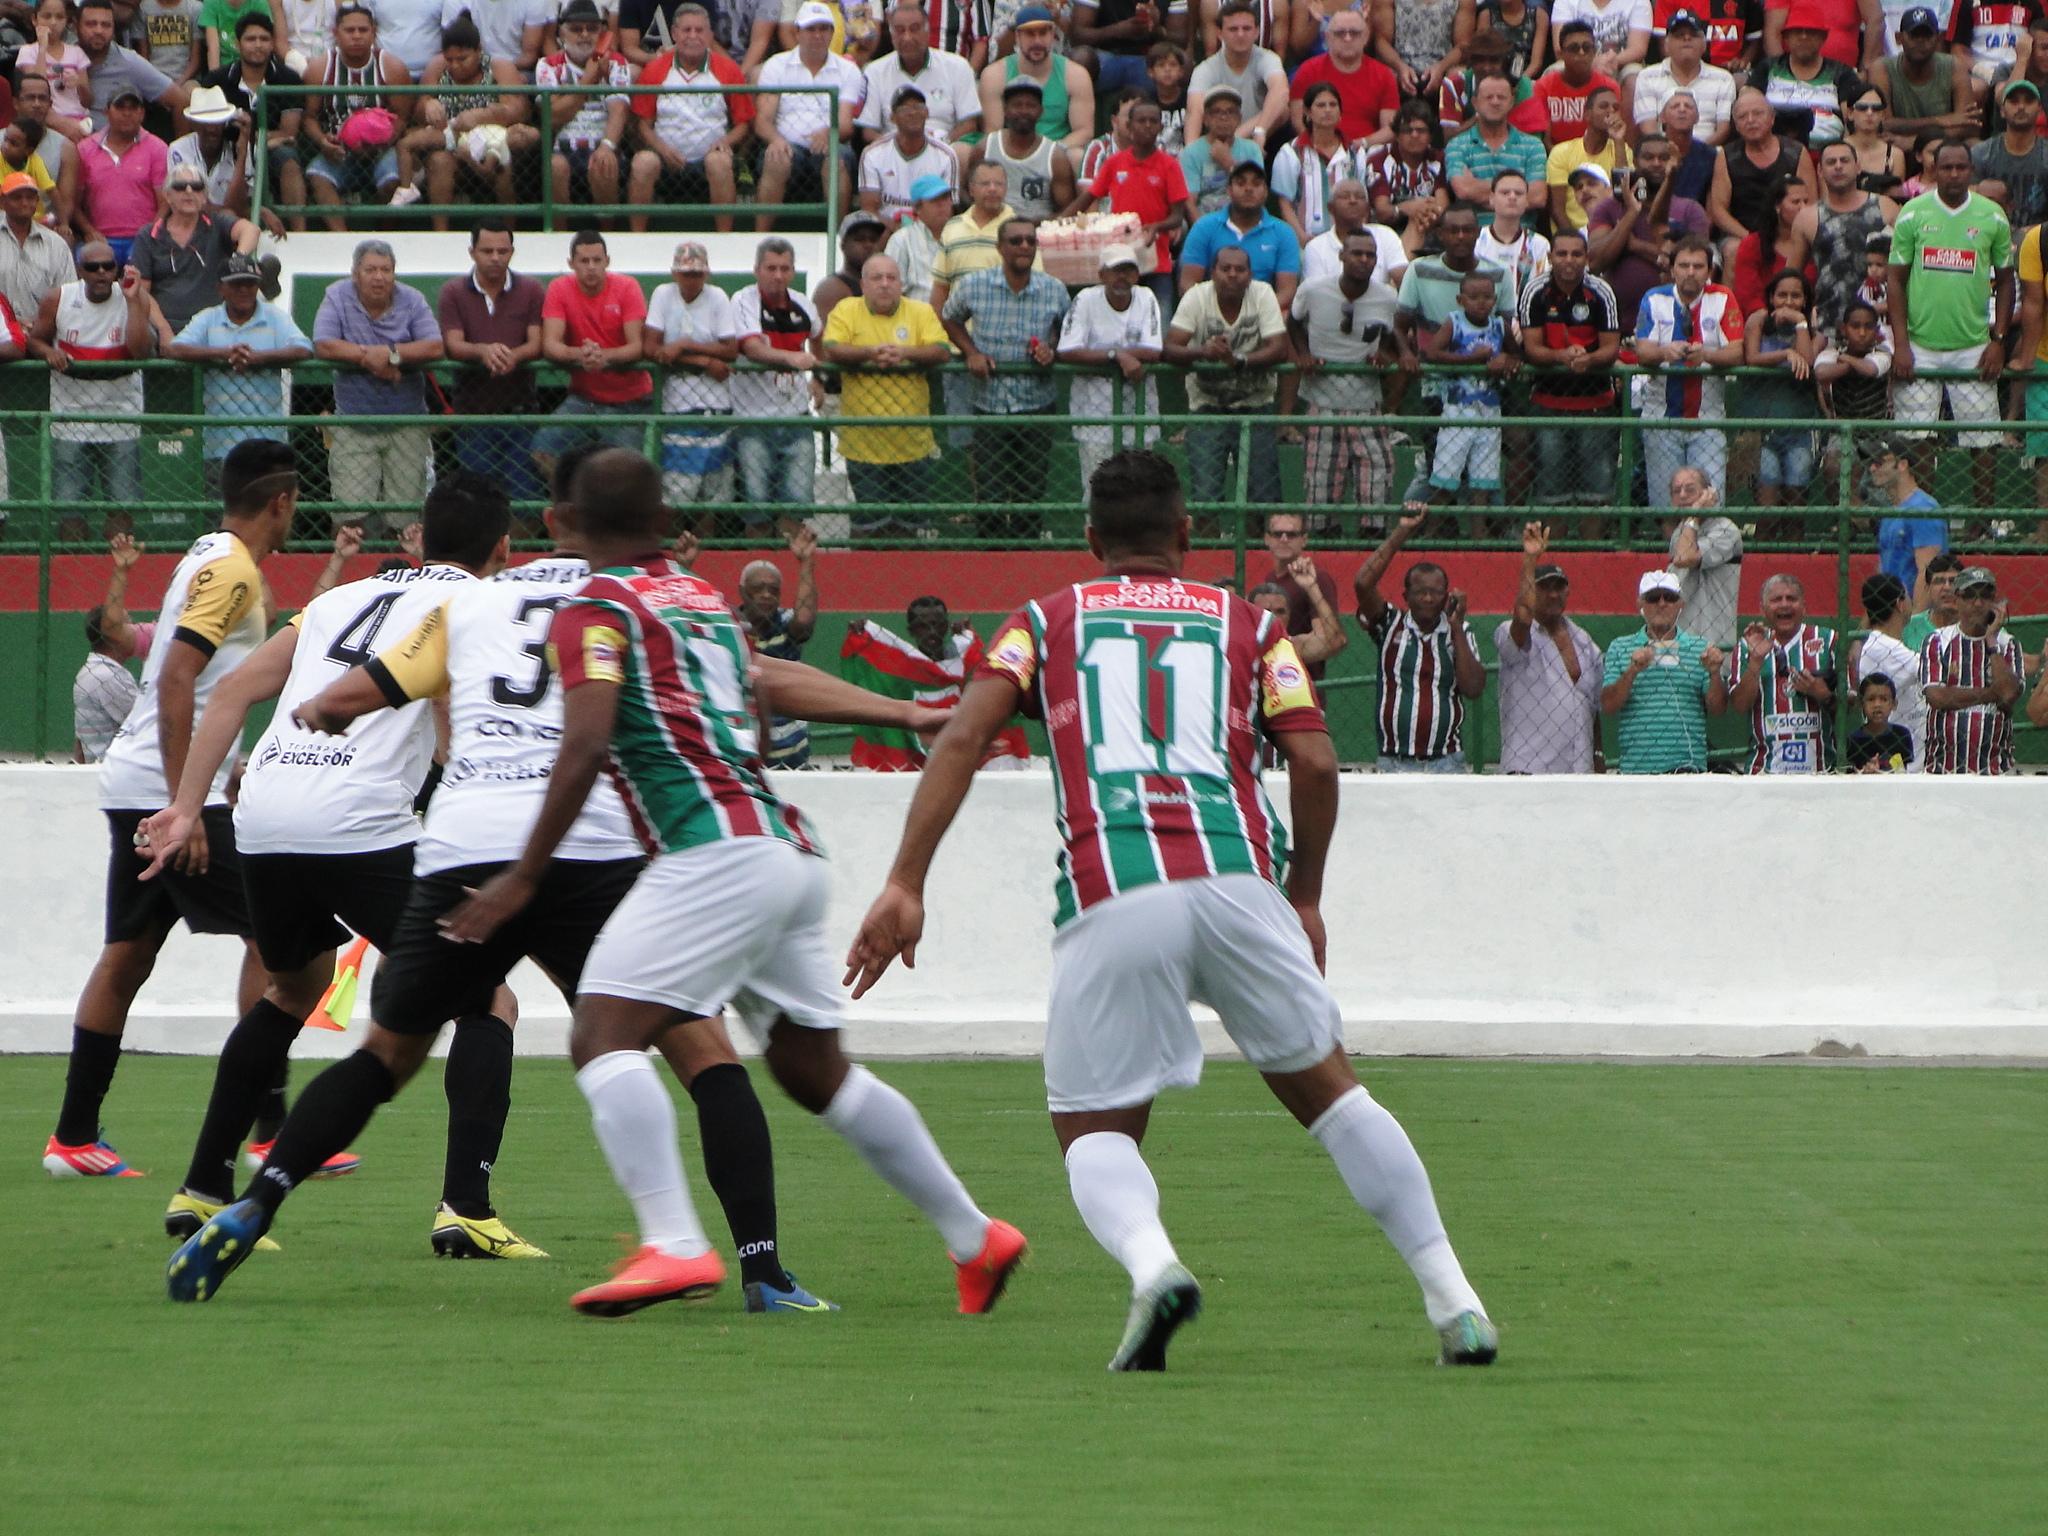 Resultado de imagem para Fluminense DE FEIRA x volta redonda d